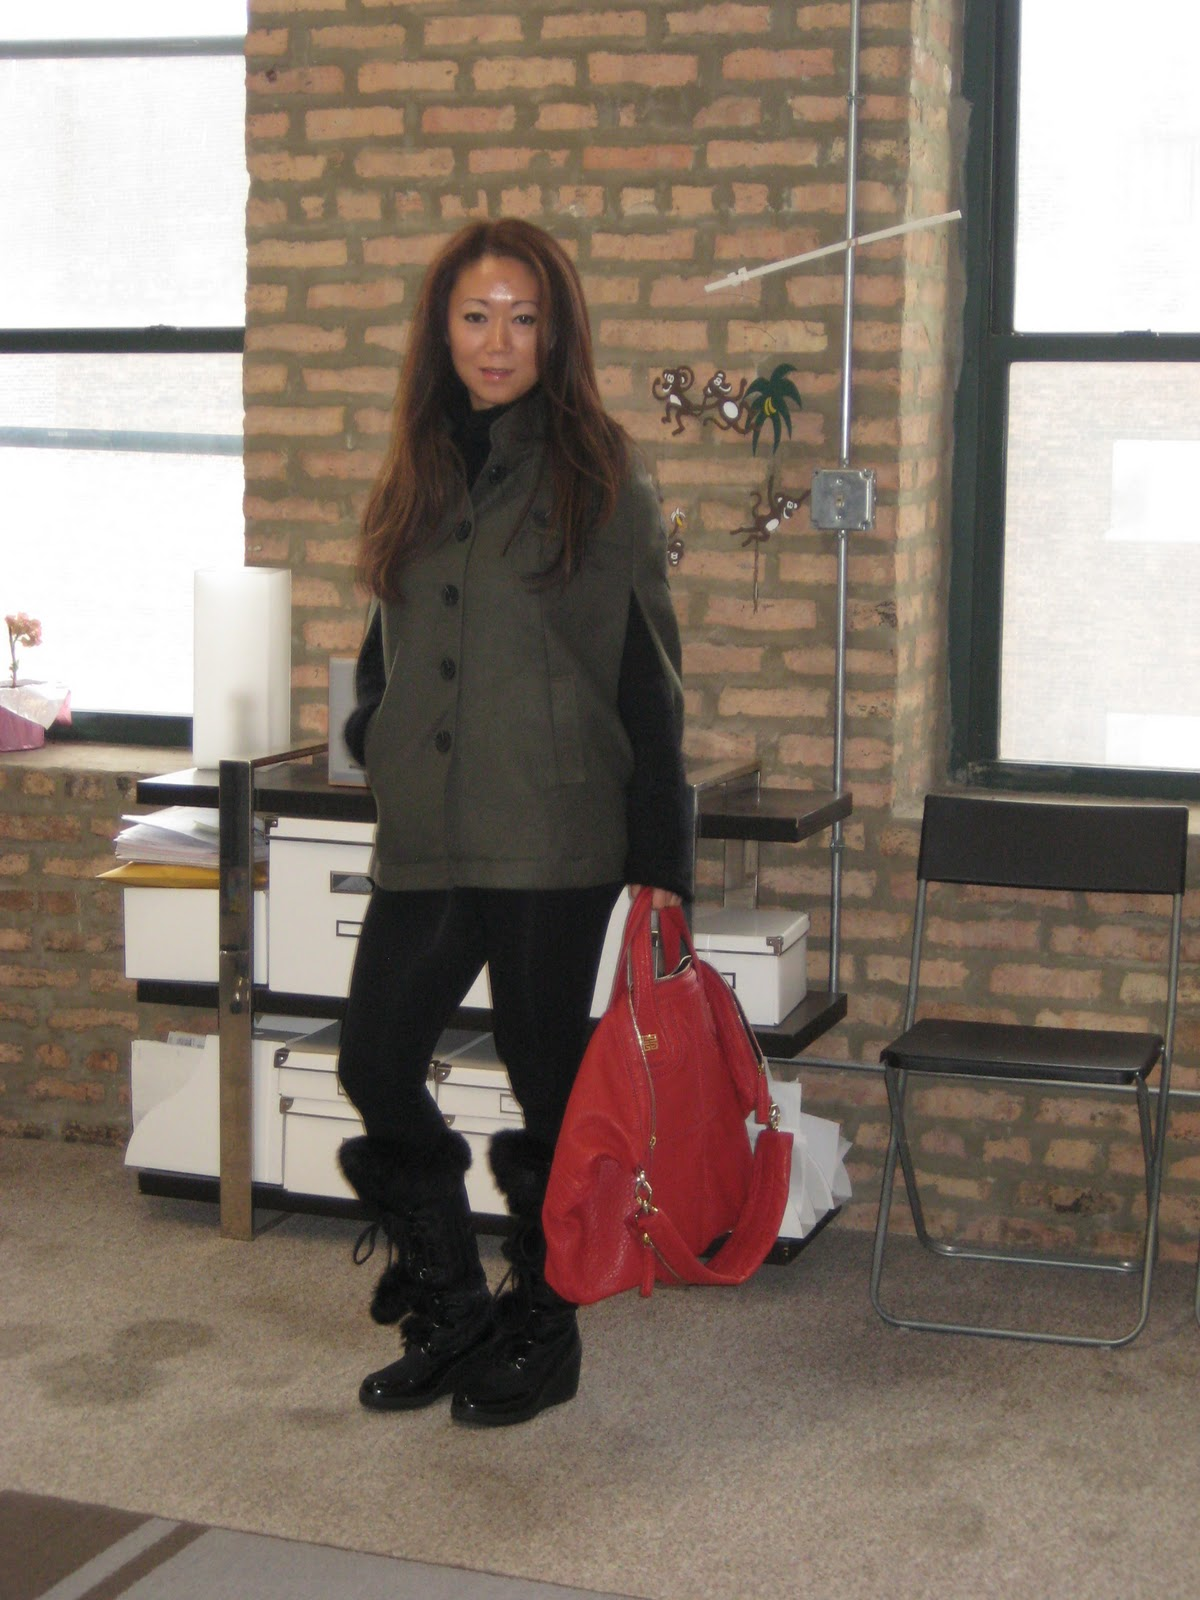 Mia Bossi January 2011